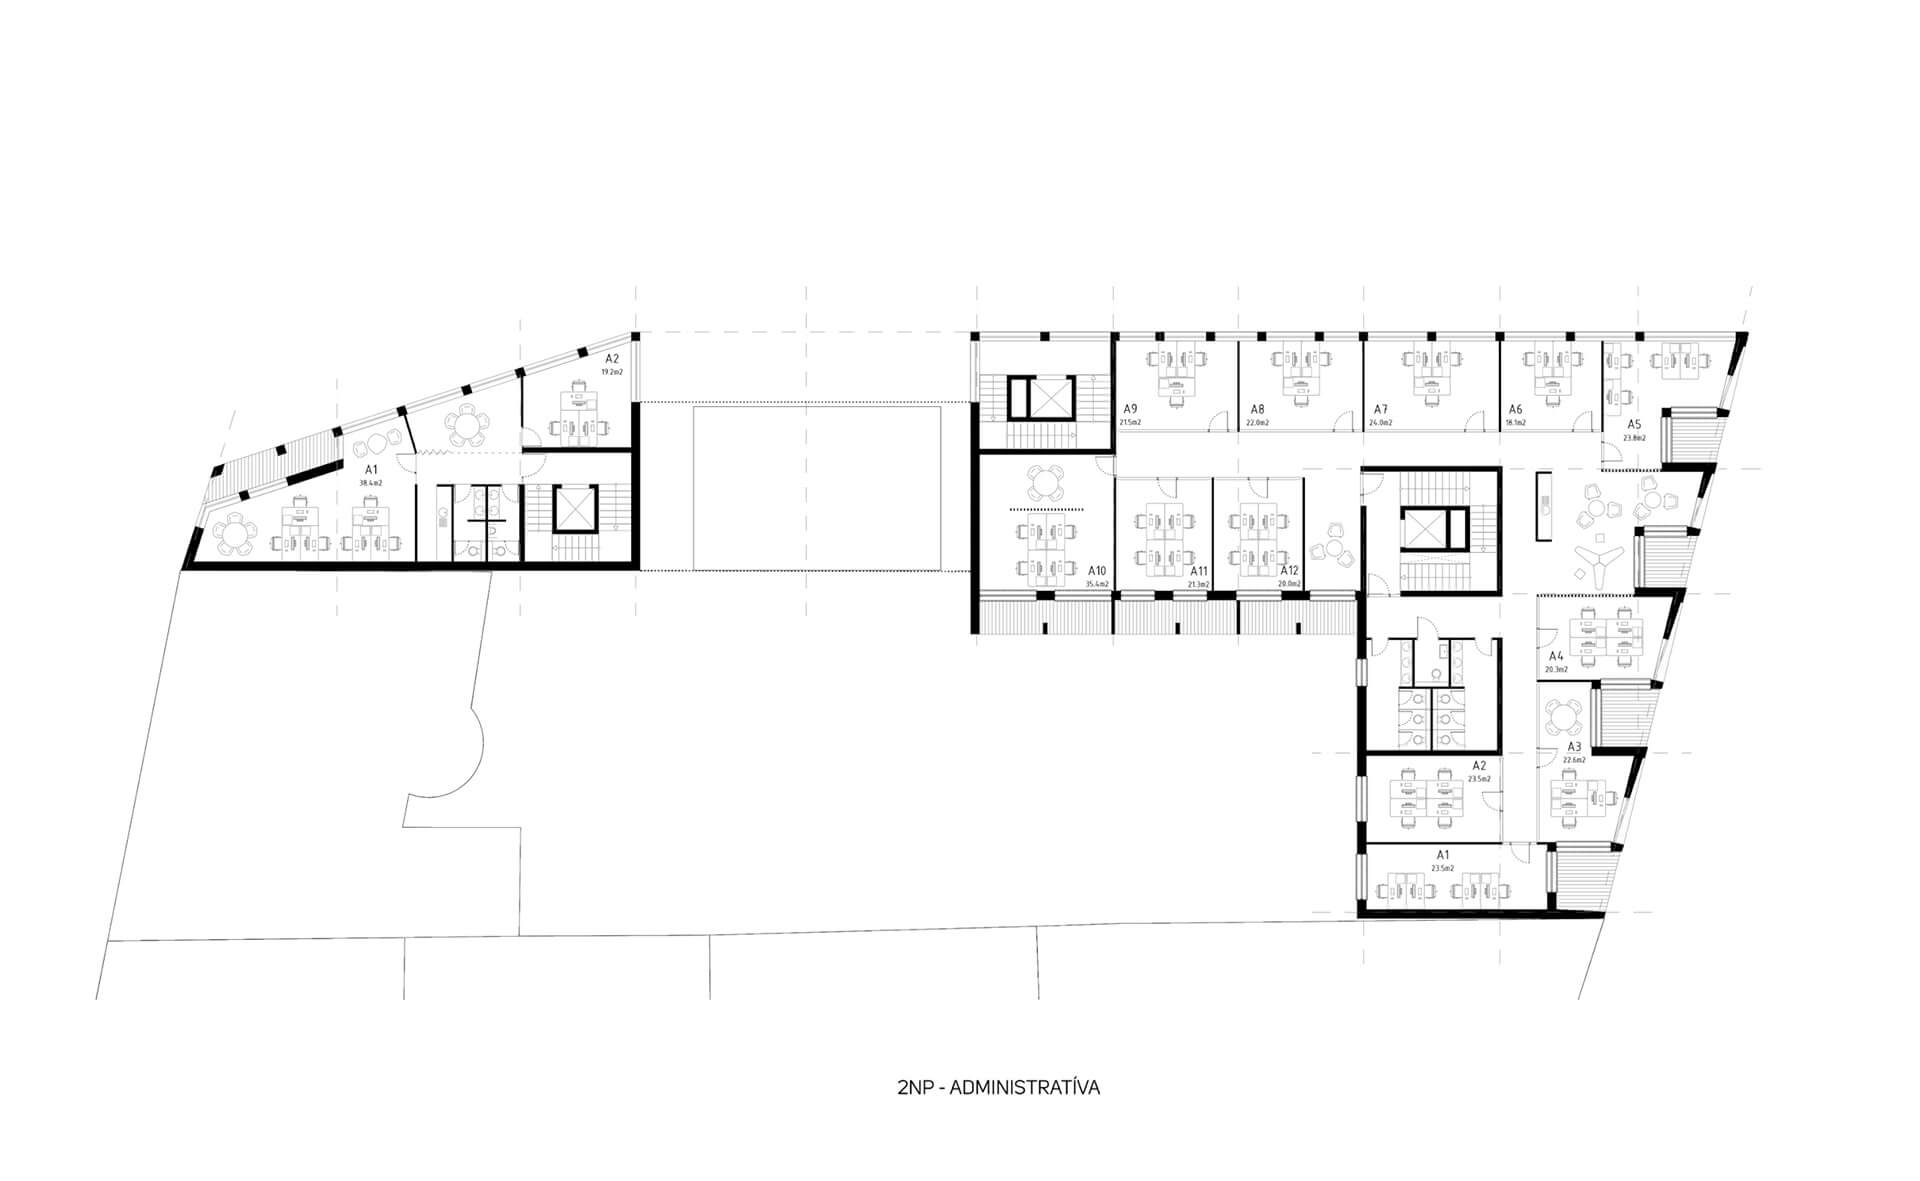 sutaz-bytovy-dom-ostrava_schema_gif_4